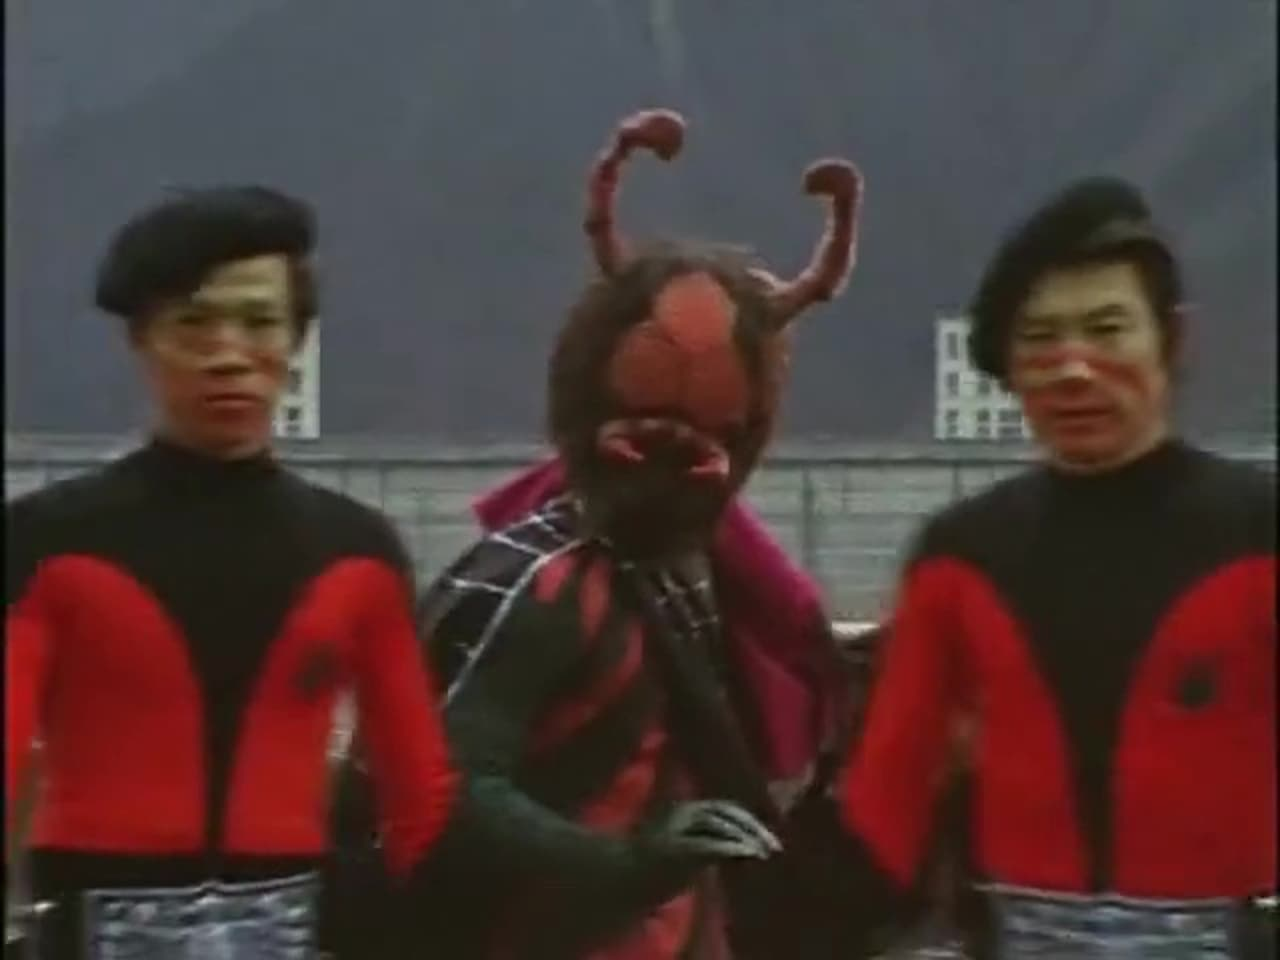 Kamen Rider - Season 1 Episode 1 : The Mysterious Spider Man (2020)